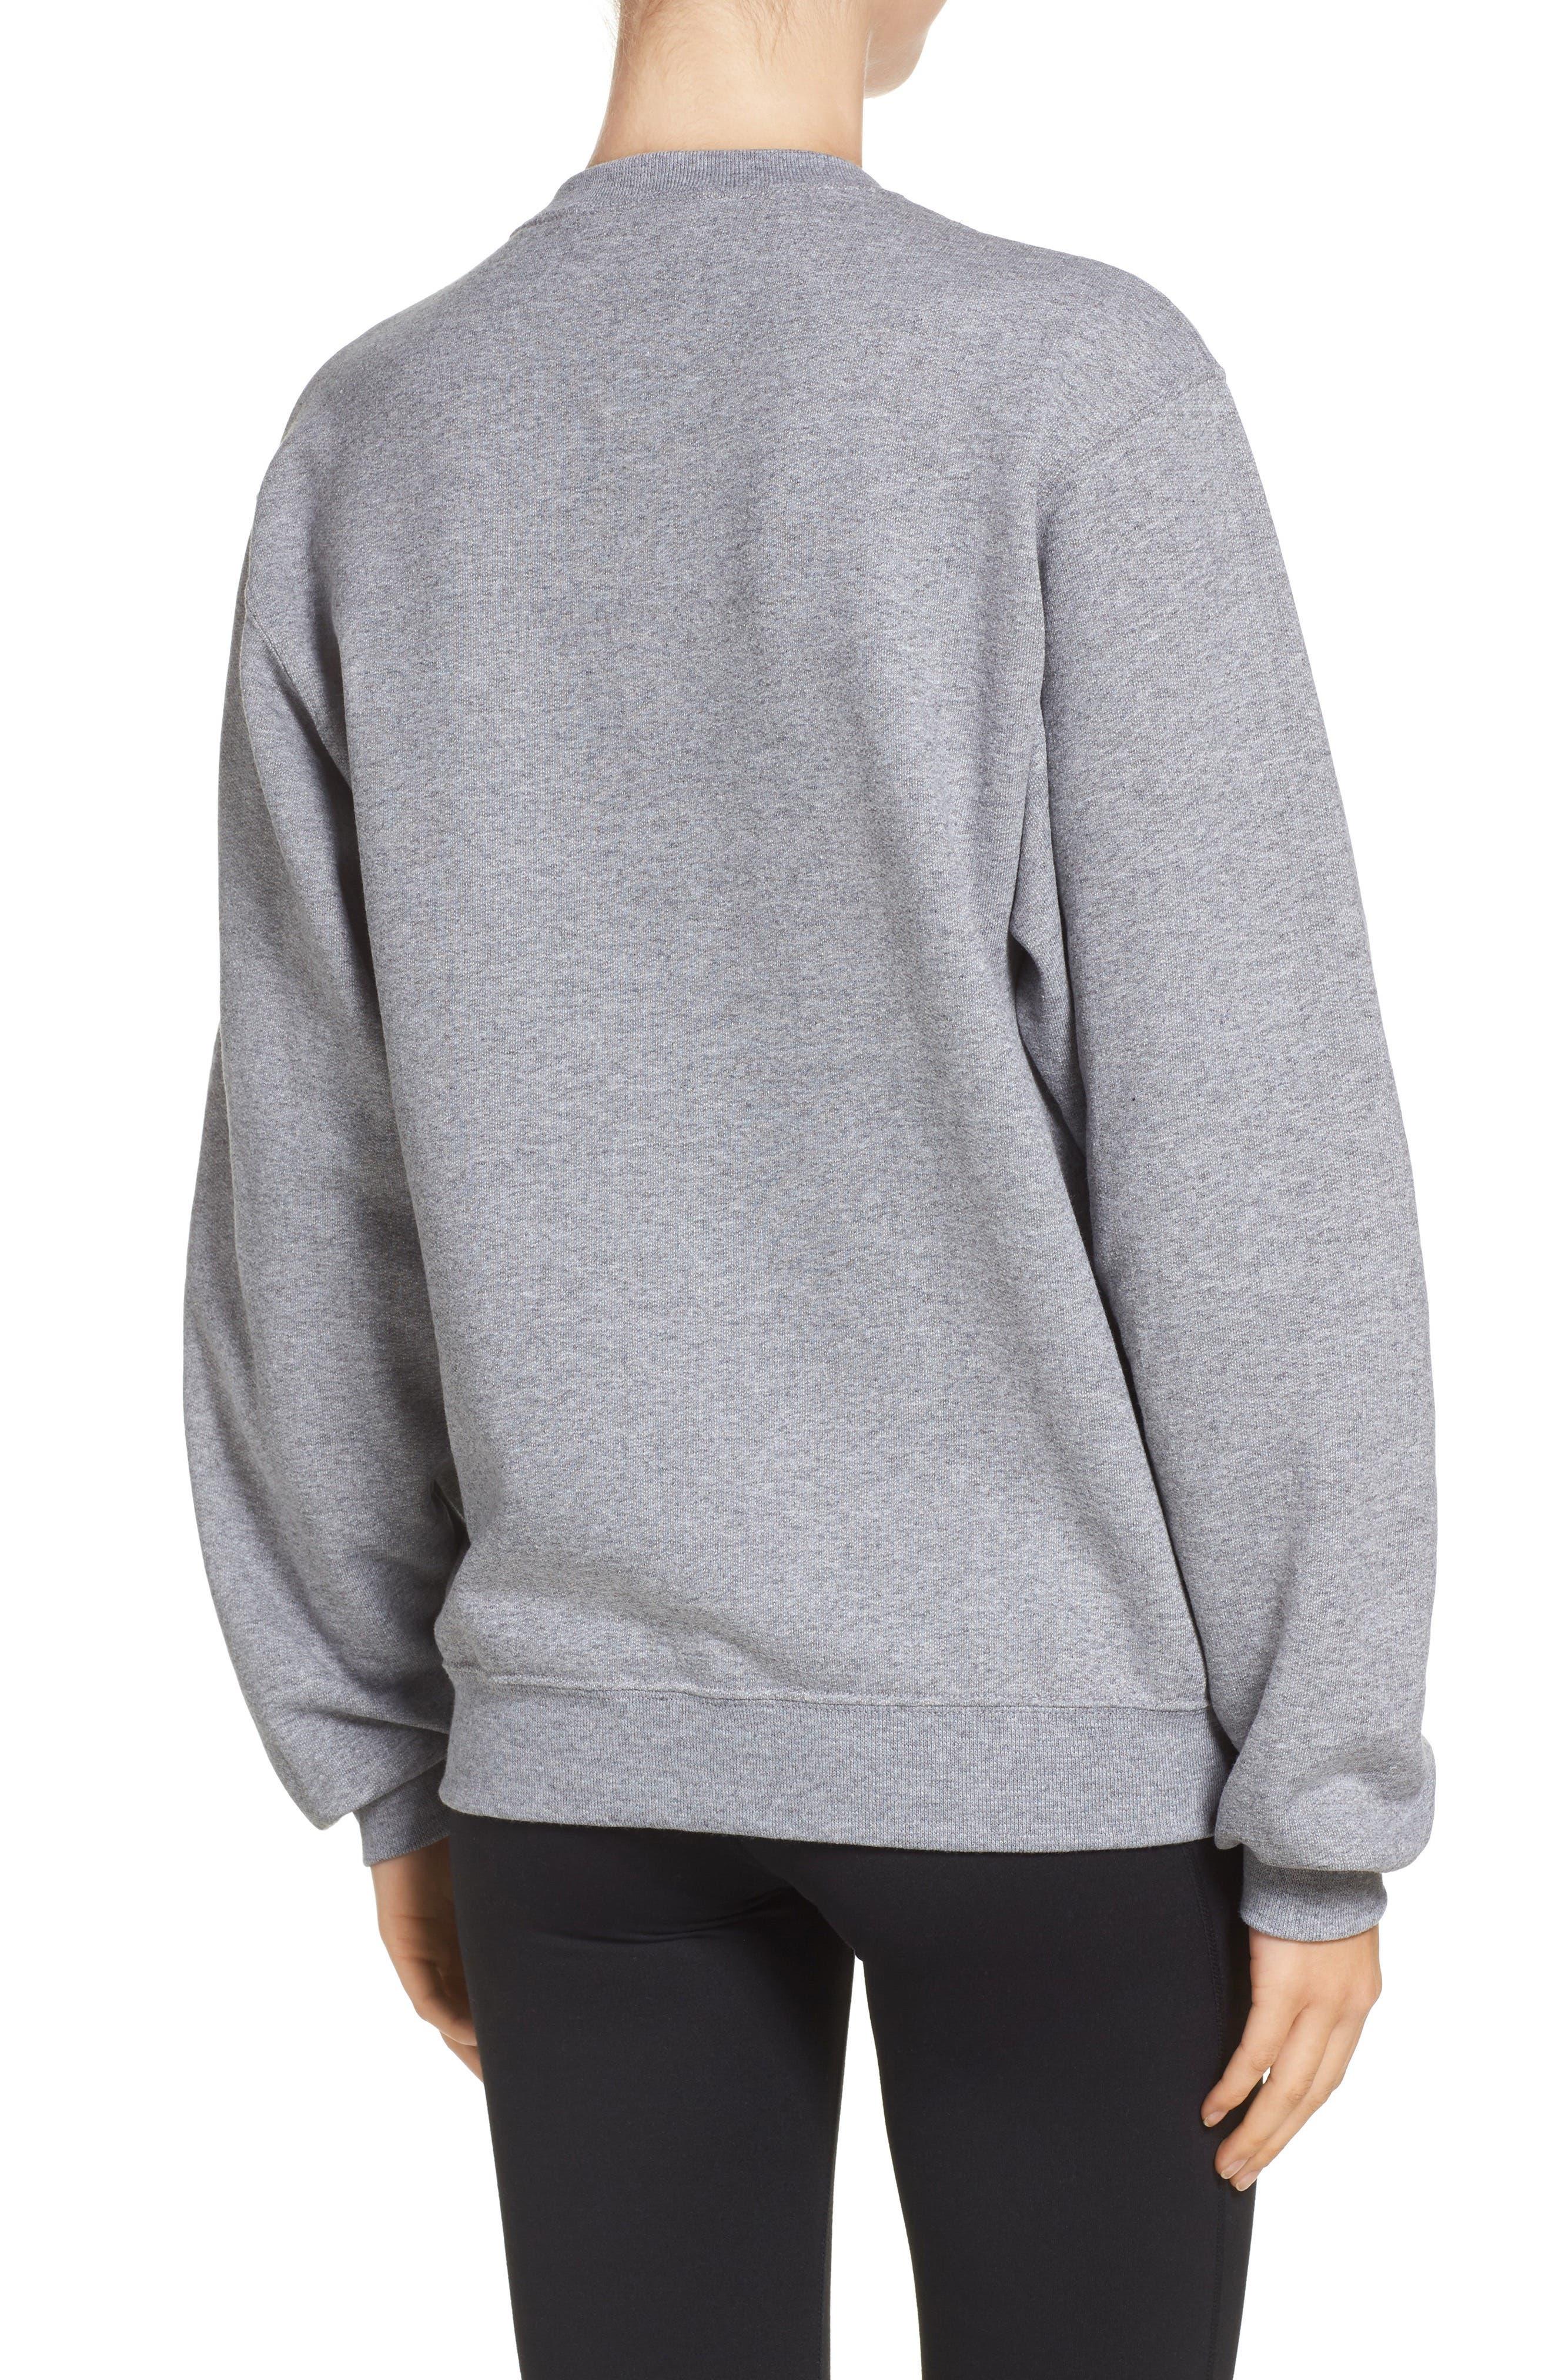 Workout Brunch Repeat Sweatshirt,                             Alternate thumbnail 2, color,                             Grey